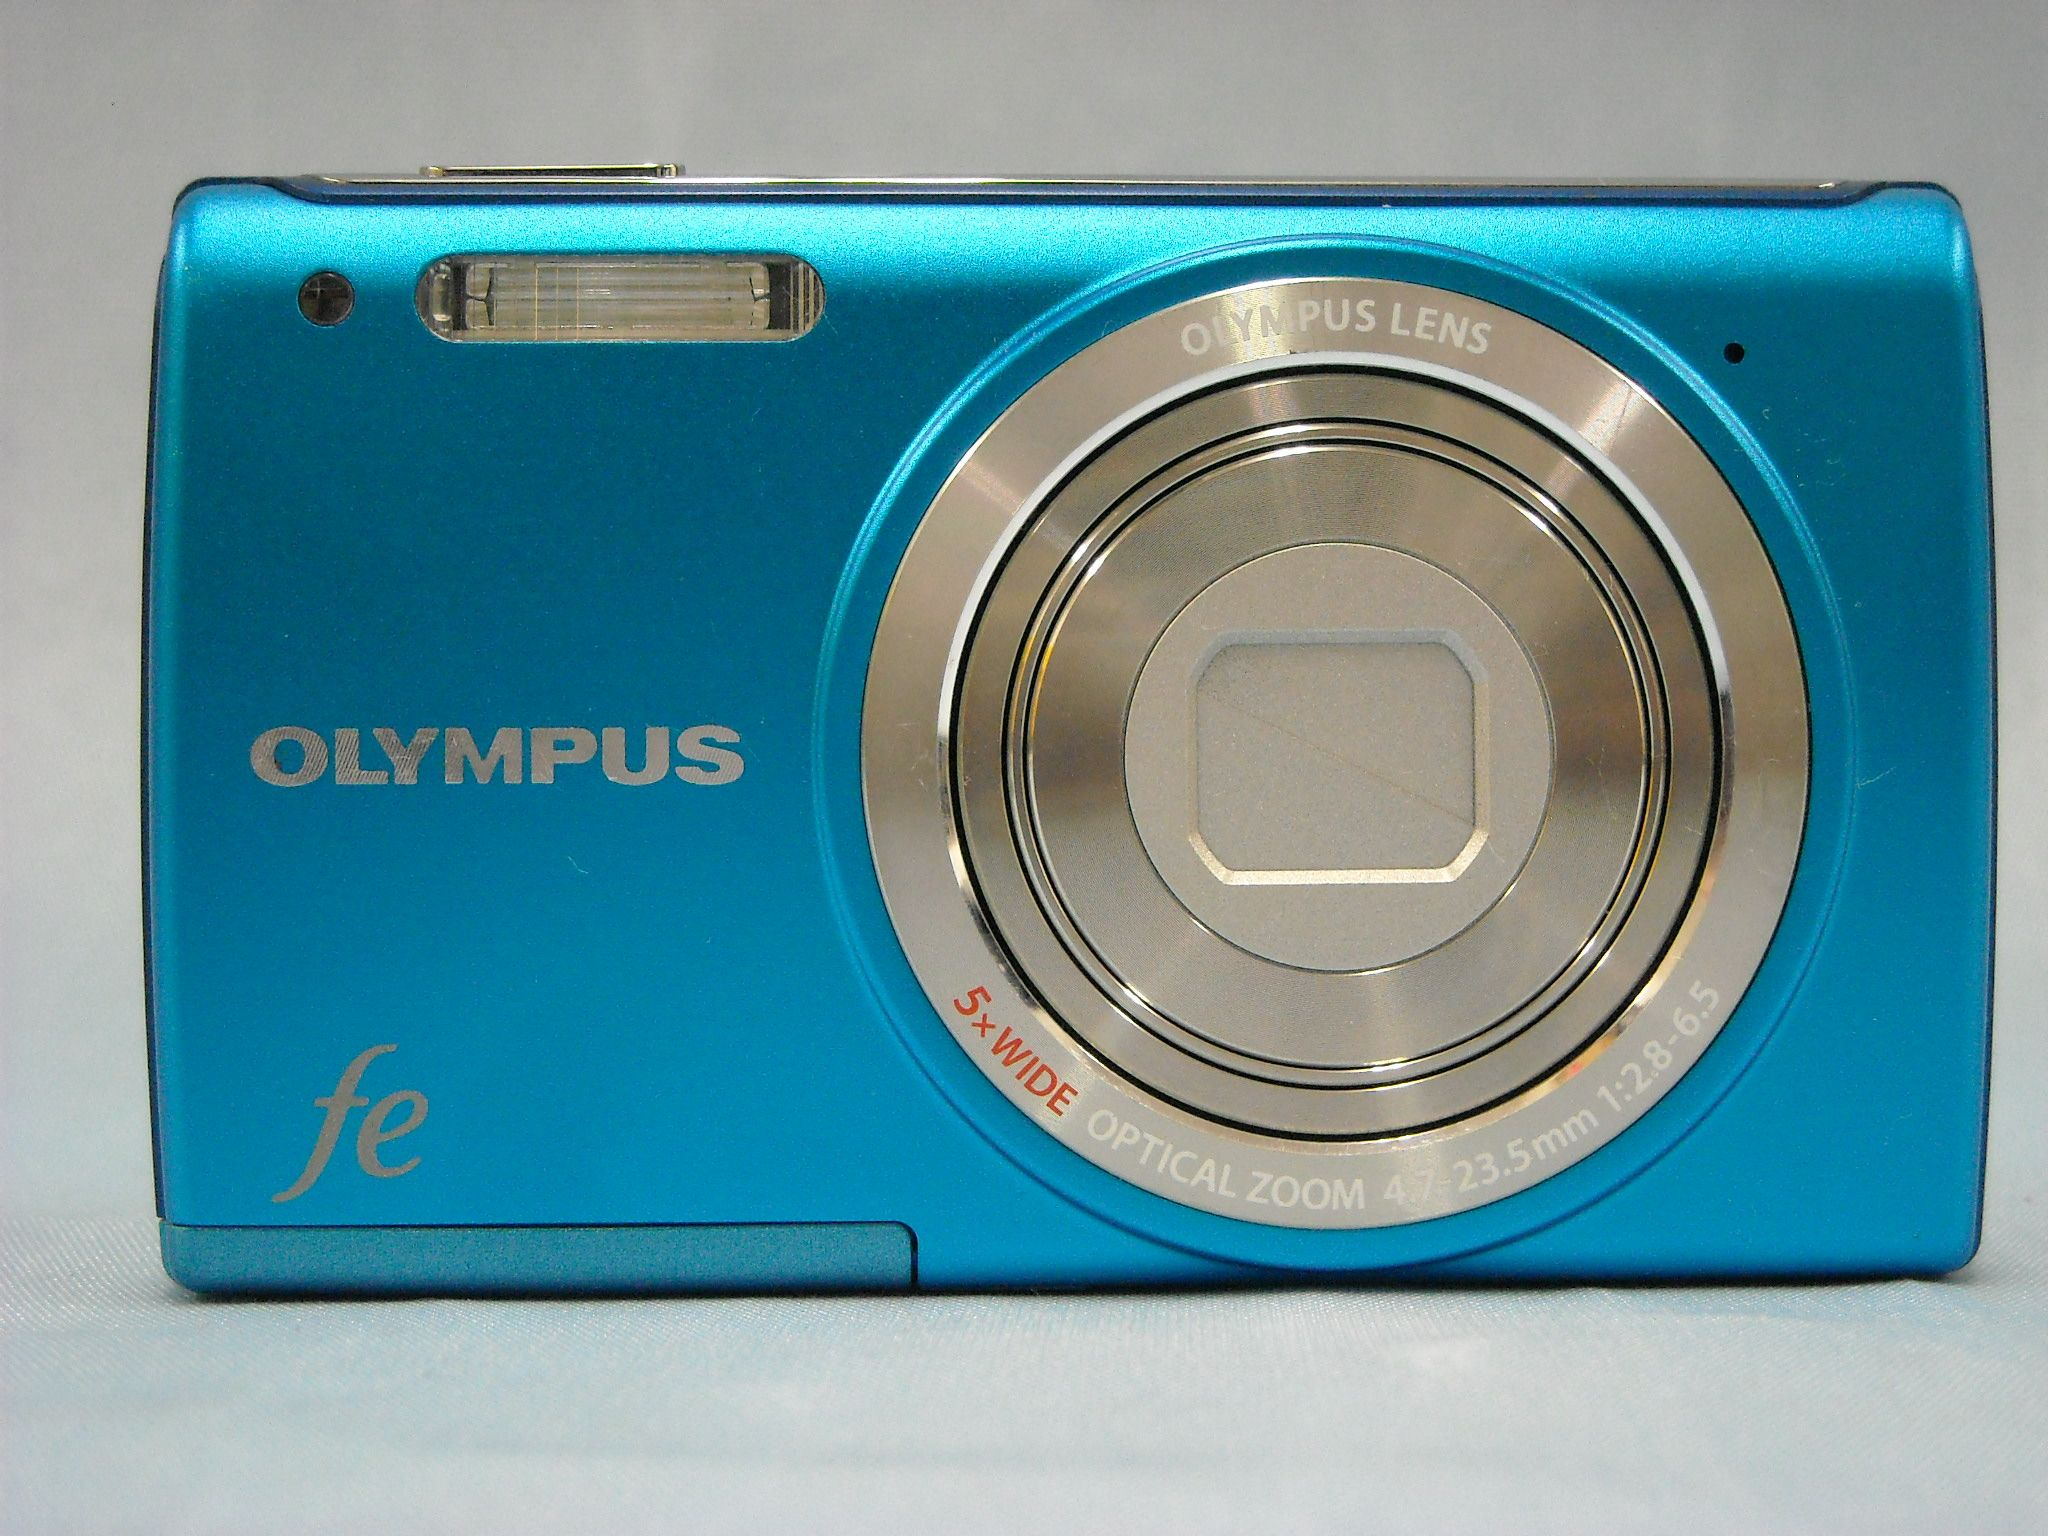 OLYMPUSデジタルカメラ買取 名古屋リサイクルショップ ハードオフ西尾